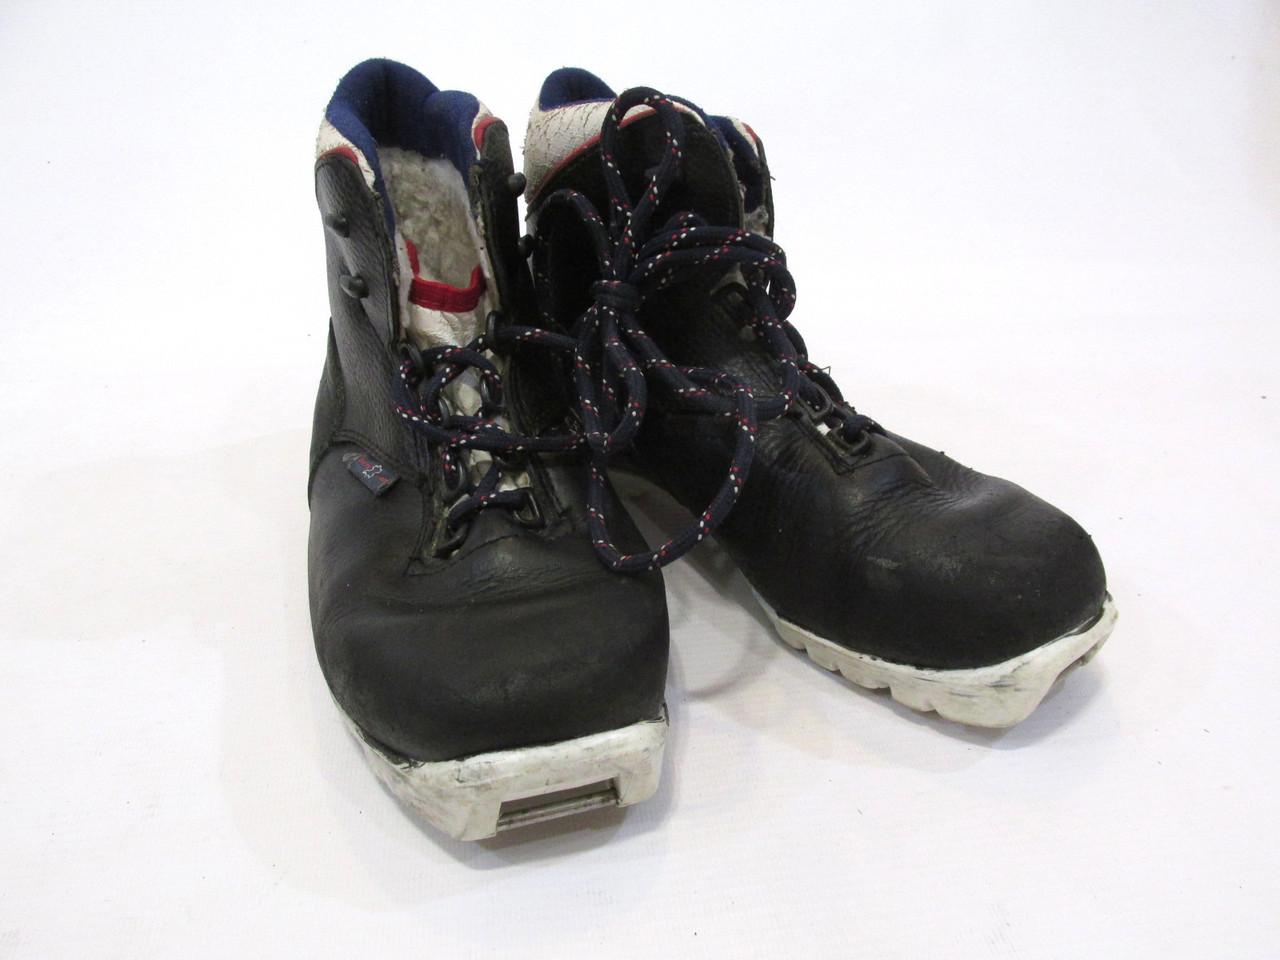 Ботинки лыжные Alpitex, Thinsulate, NNN, 23 см (36) кожа, Оч хор сост!